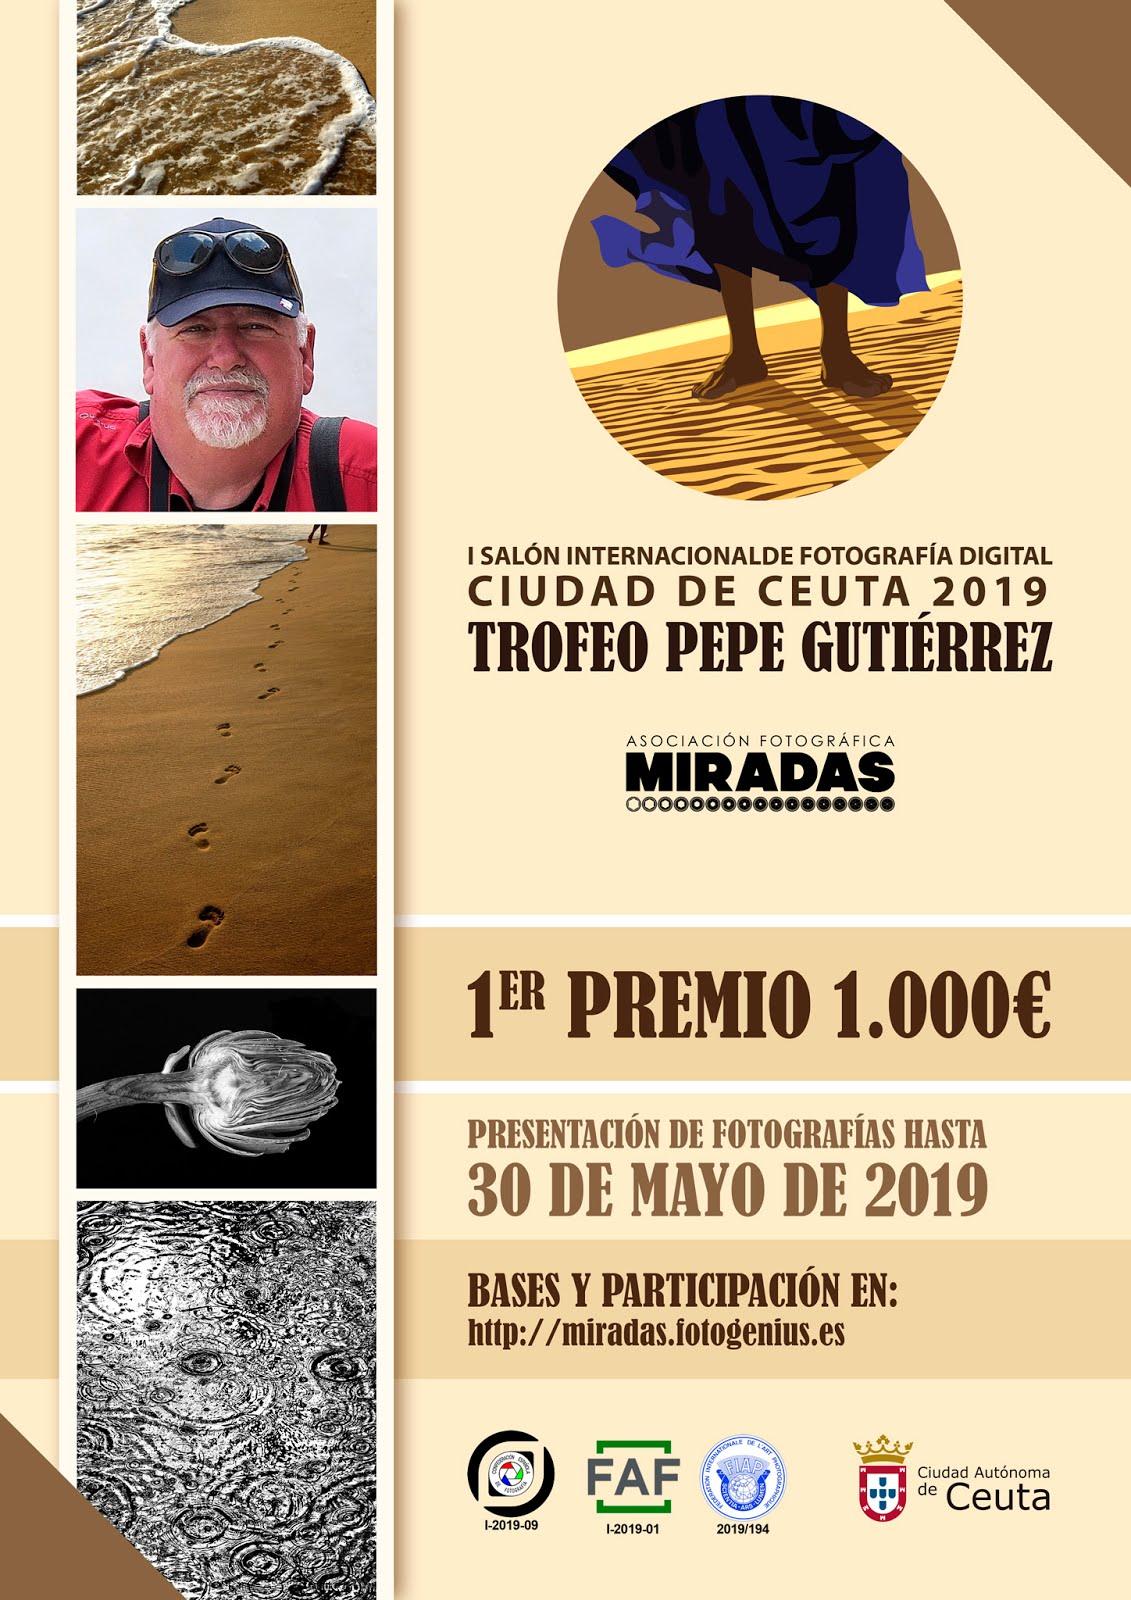 Trofeo Pepe Gutiérrez